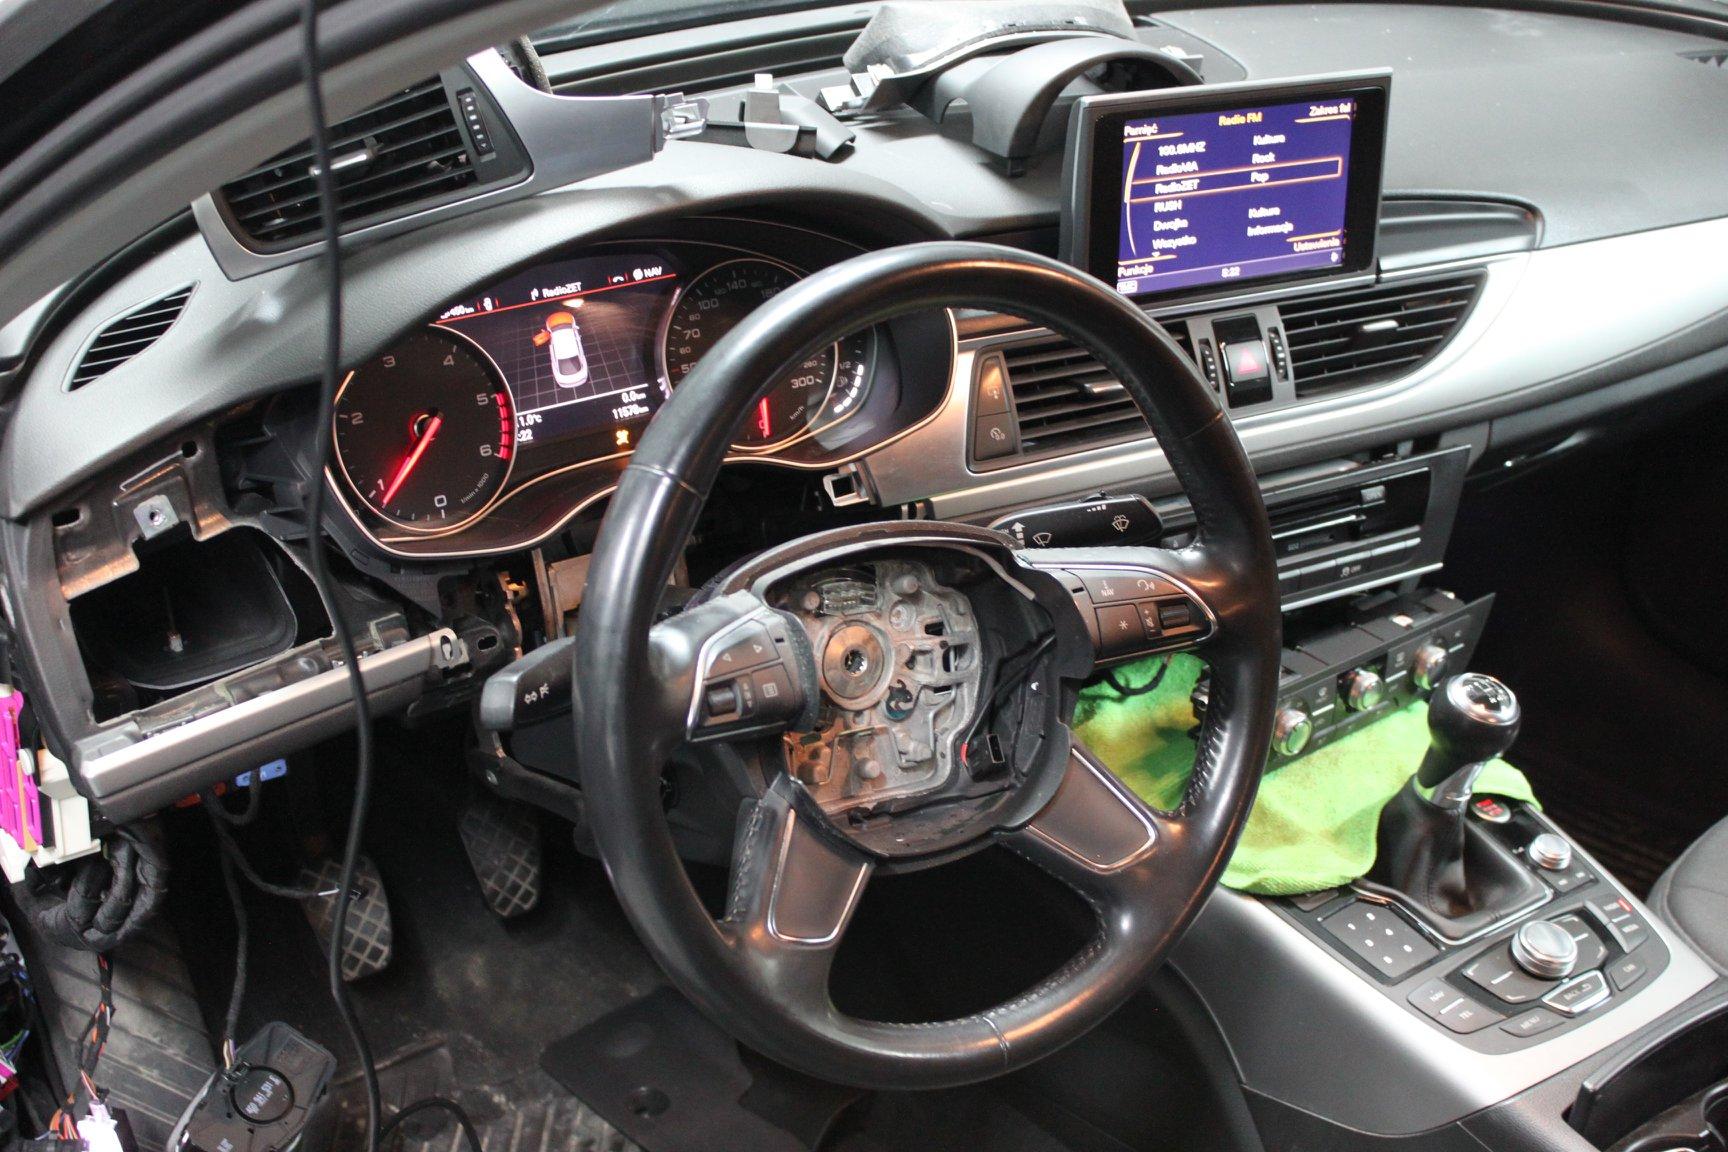 AUDI A6 C7 2.0 TDI 2012